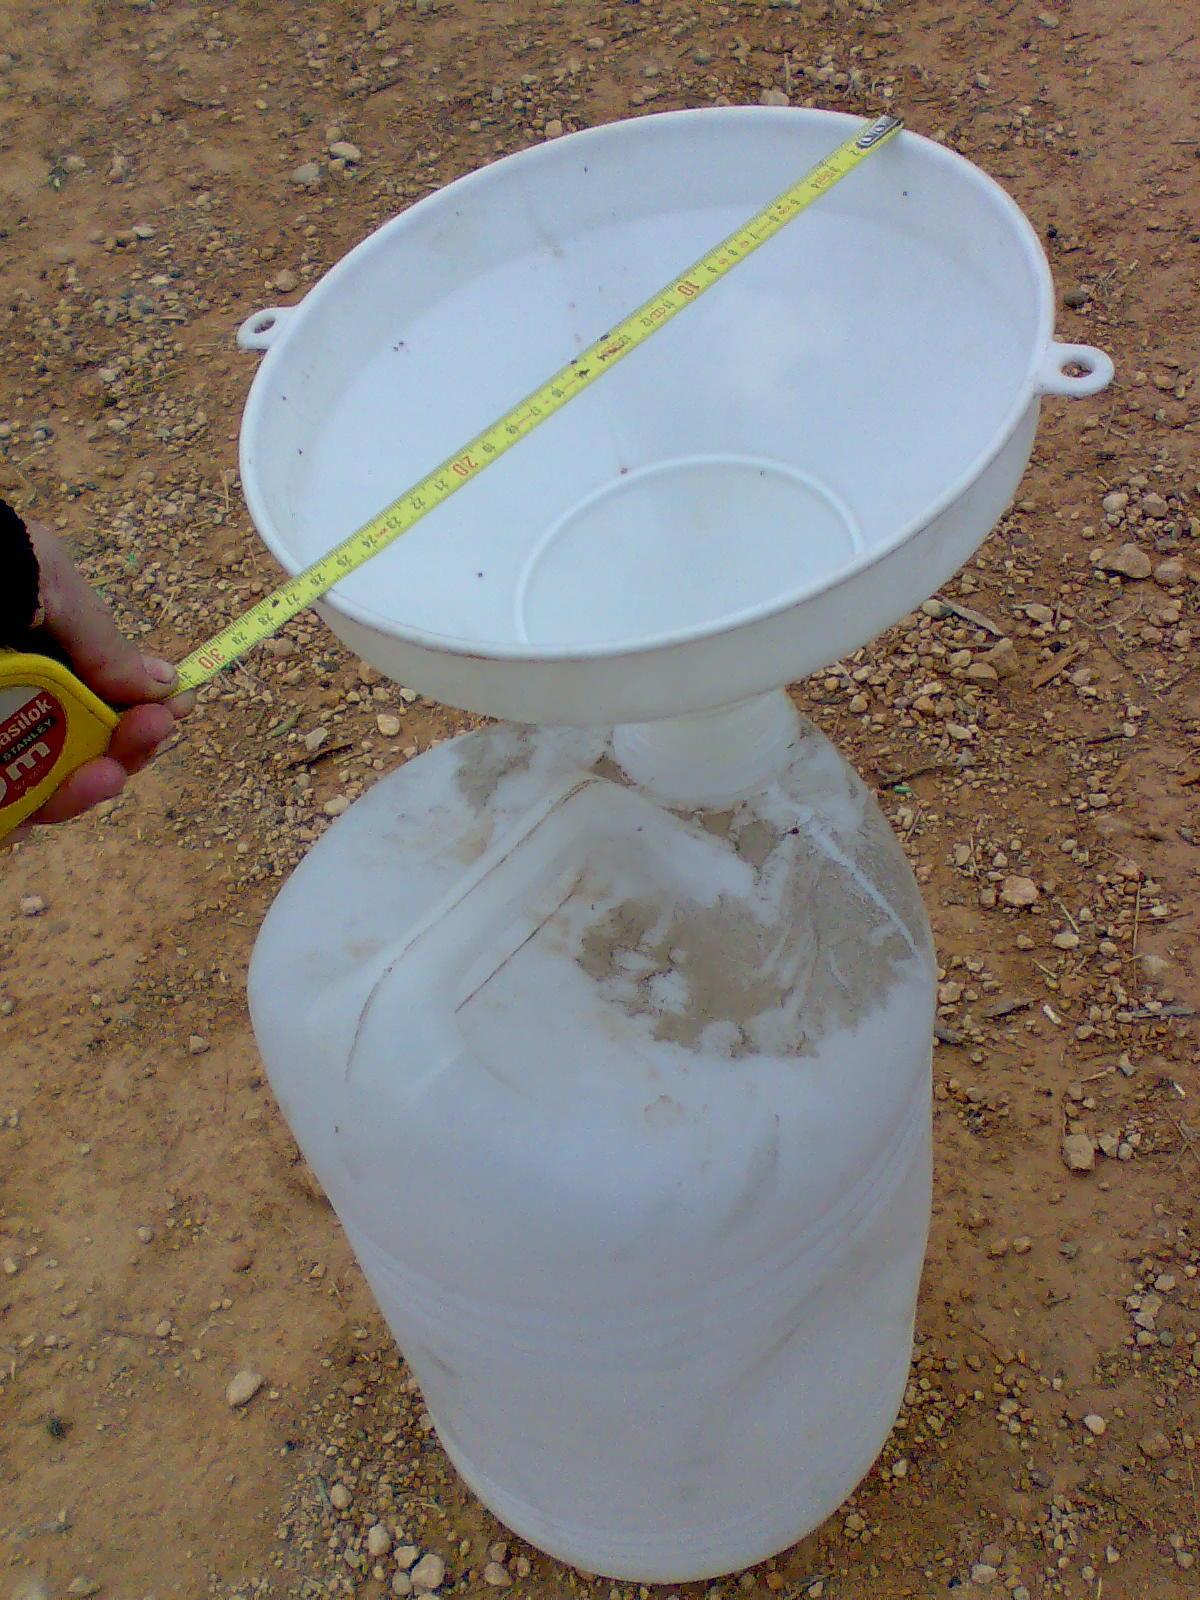 Aventuras en la palma d ebre c mo hacer un pluviometro casero - Como fabricar un pluviometro ...